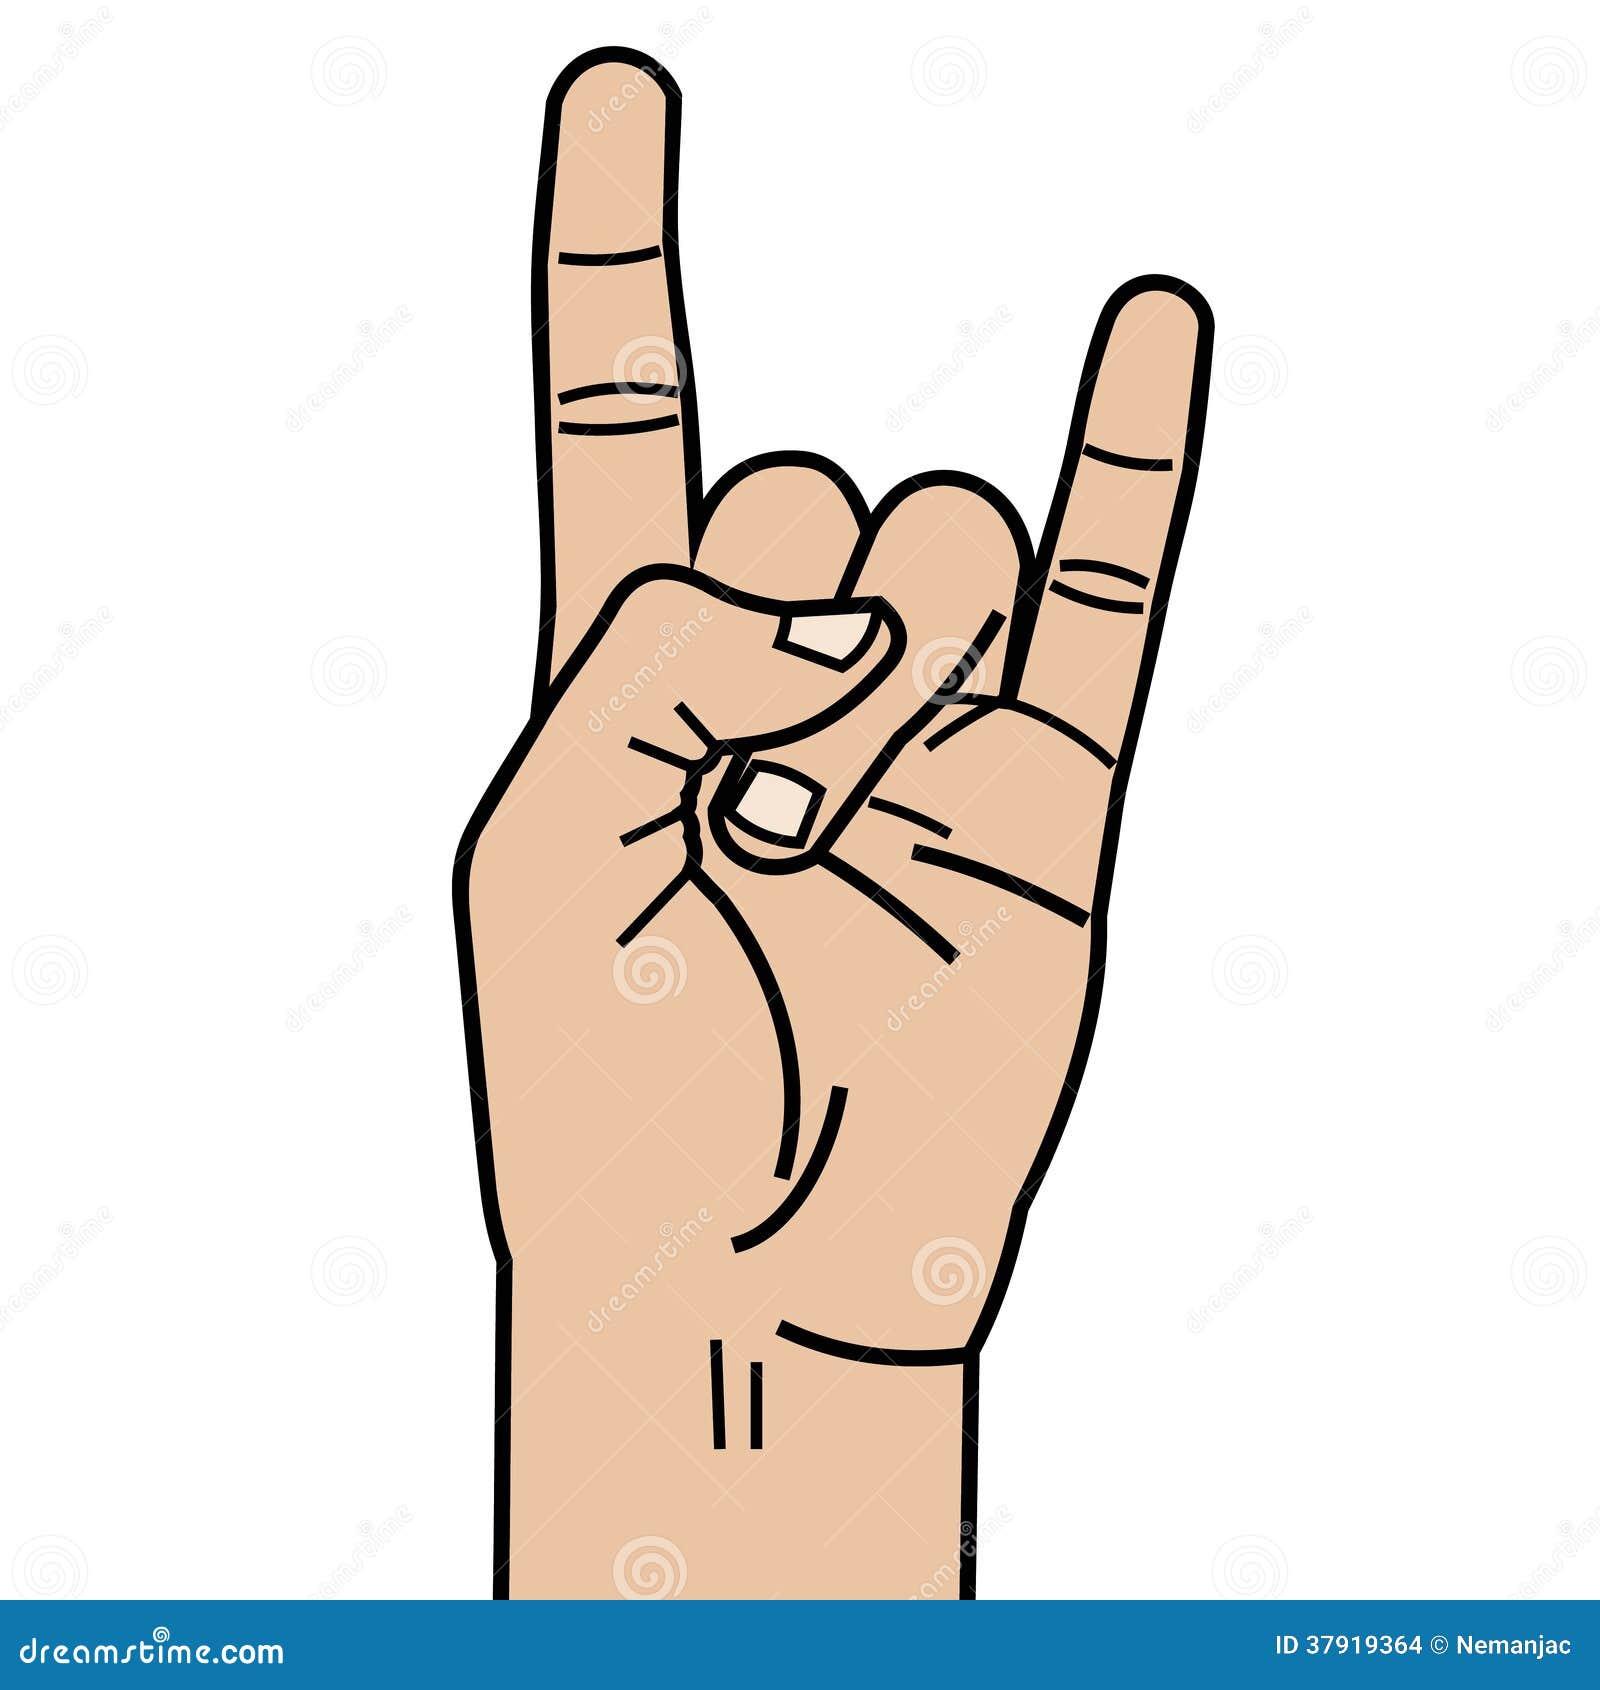 heavy metal hand linear style stock illustration illustration of